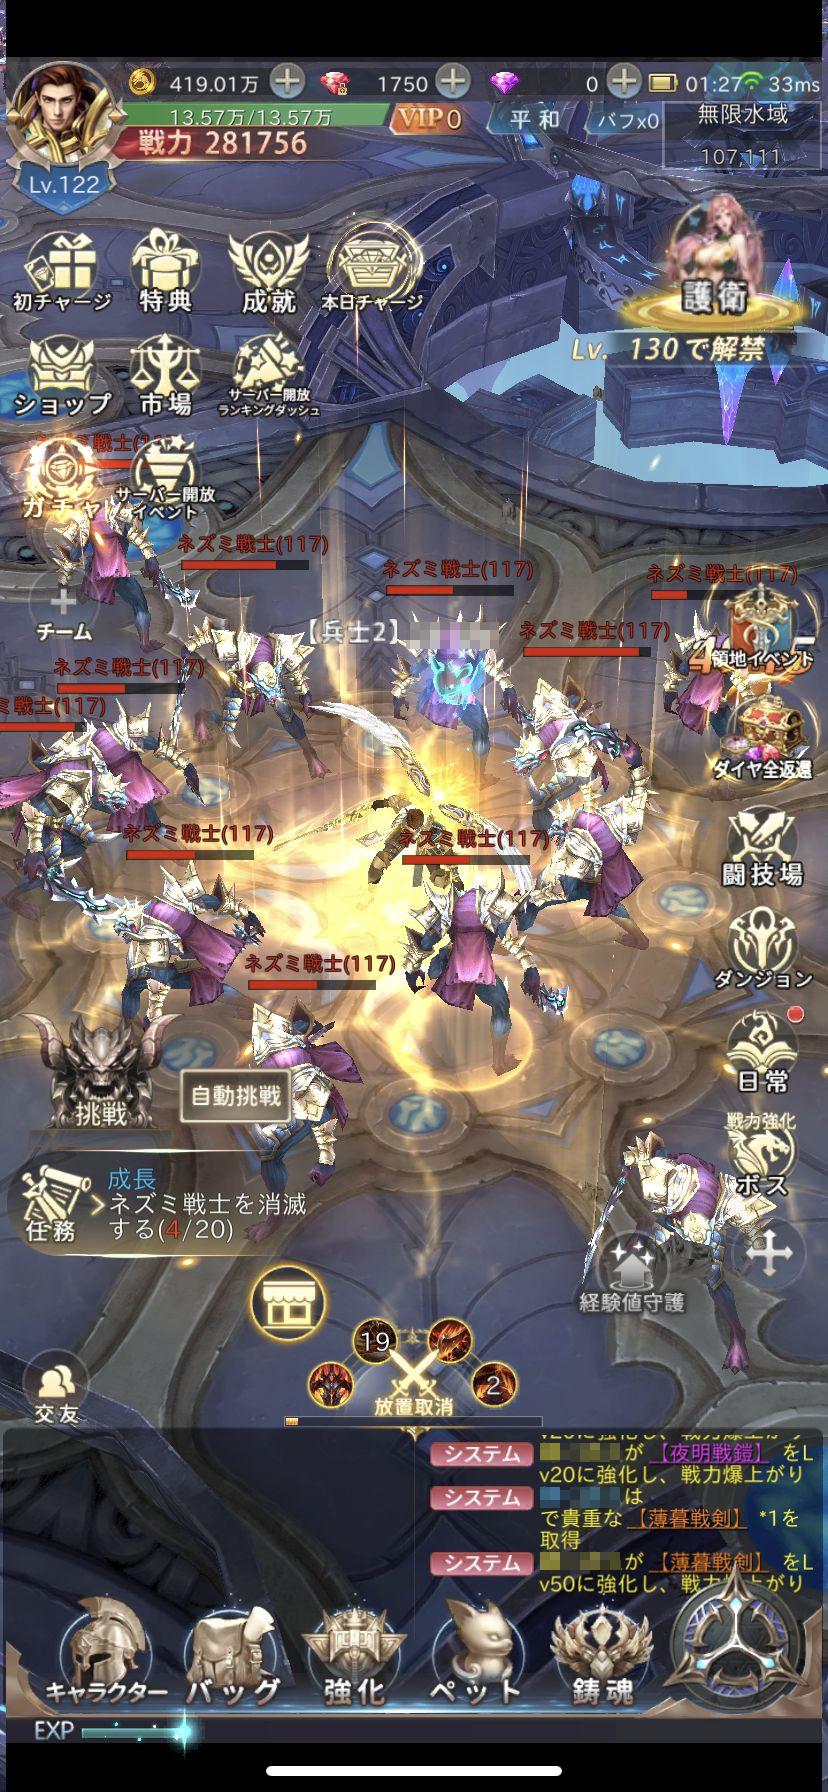 魔剣伝説コード最新